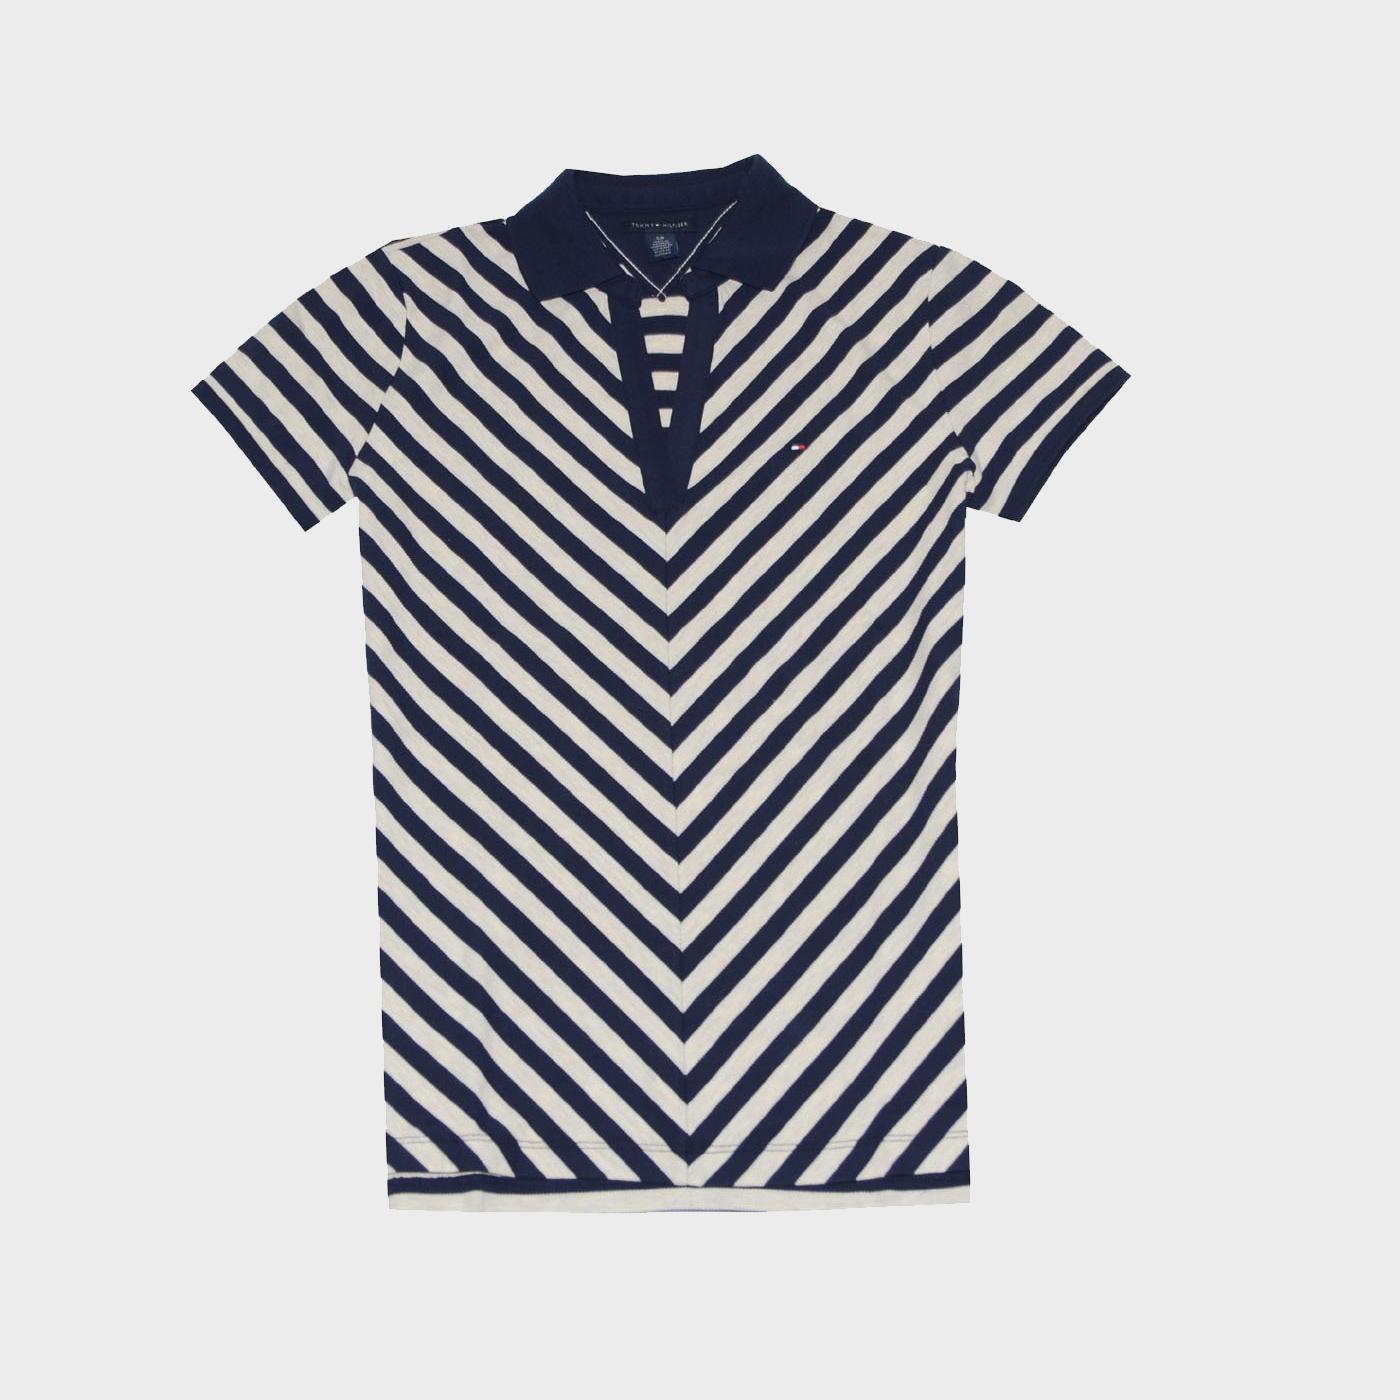 Tommy Hilfiger Women Chevron Stripe V-Neck Polo T-shirt